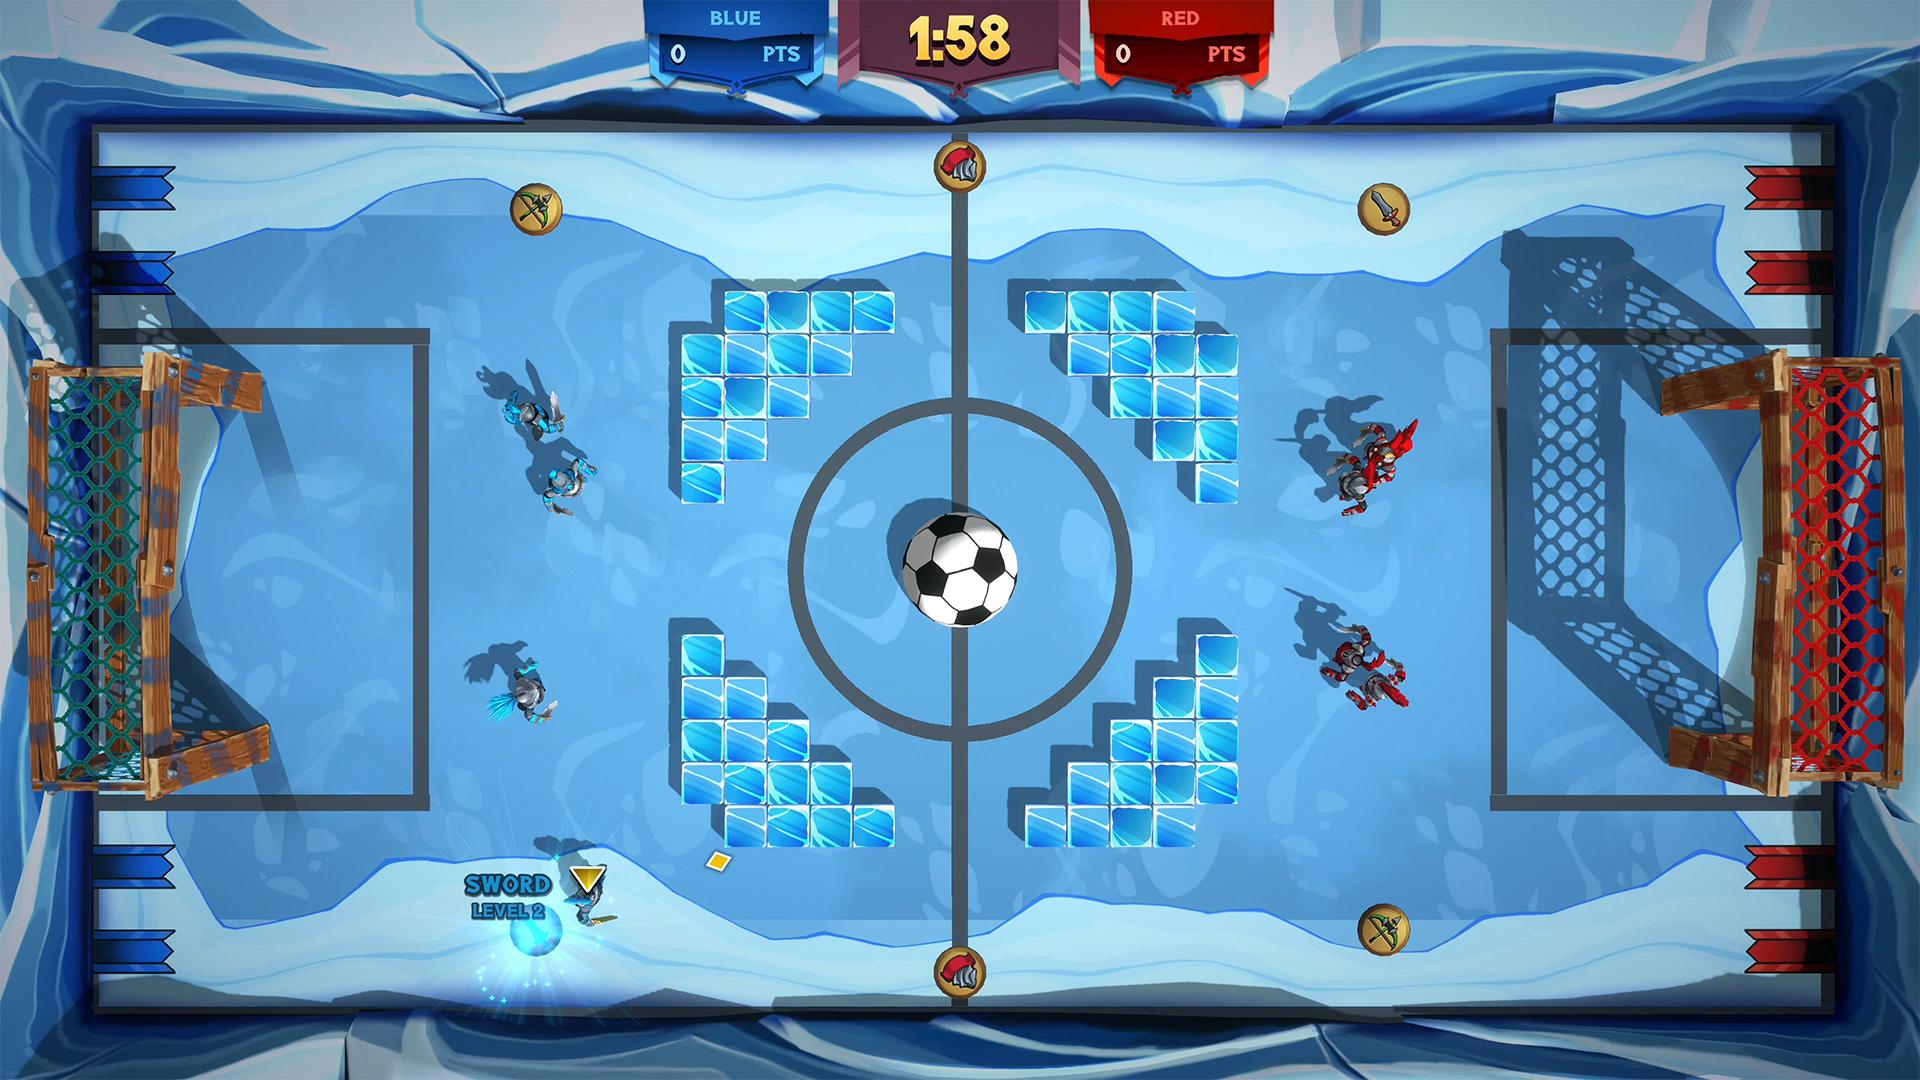 Knight Squad 2 ice soccer